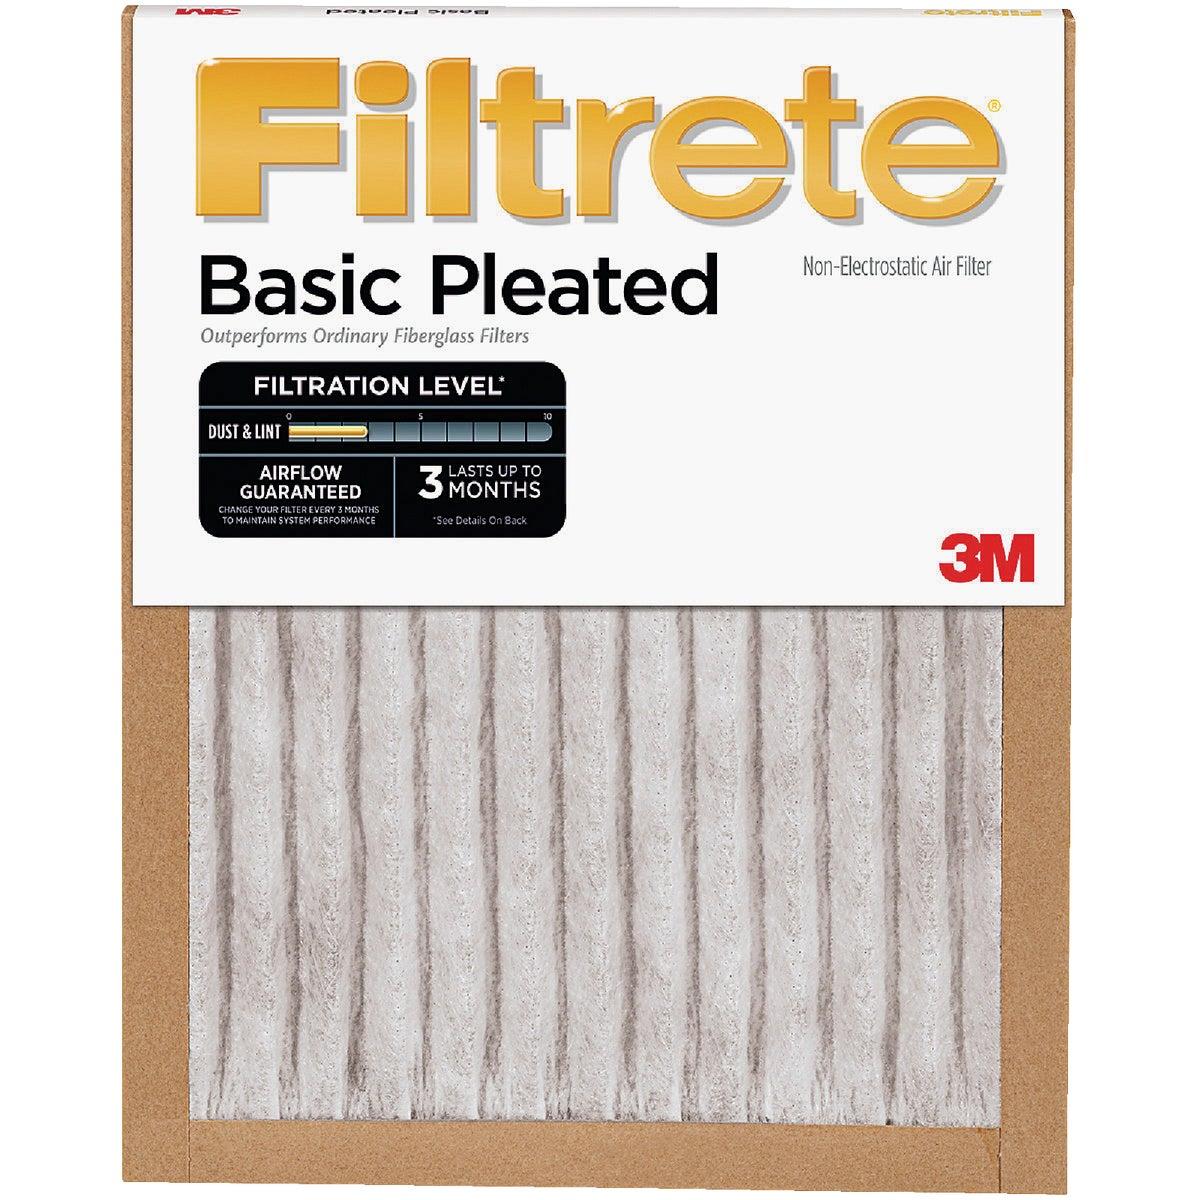 3M Filtrete 20 In. x 25 In. x 1 In. Basic Pleated 250 MPR Furnace Filter